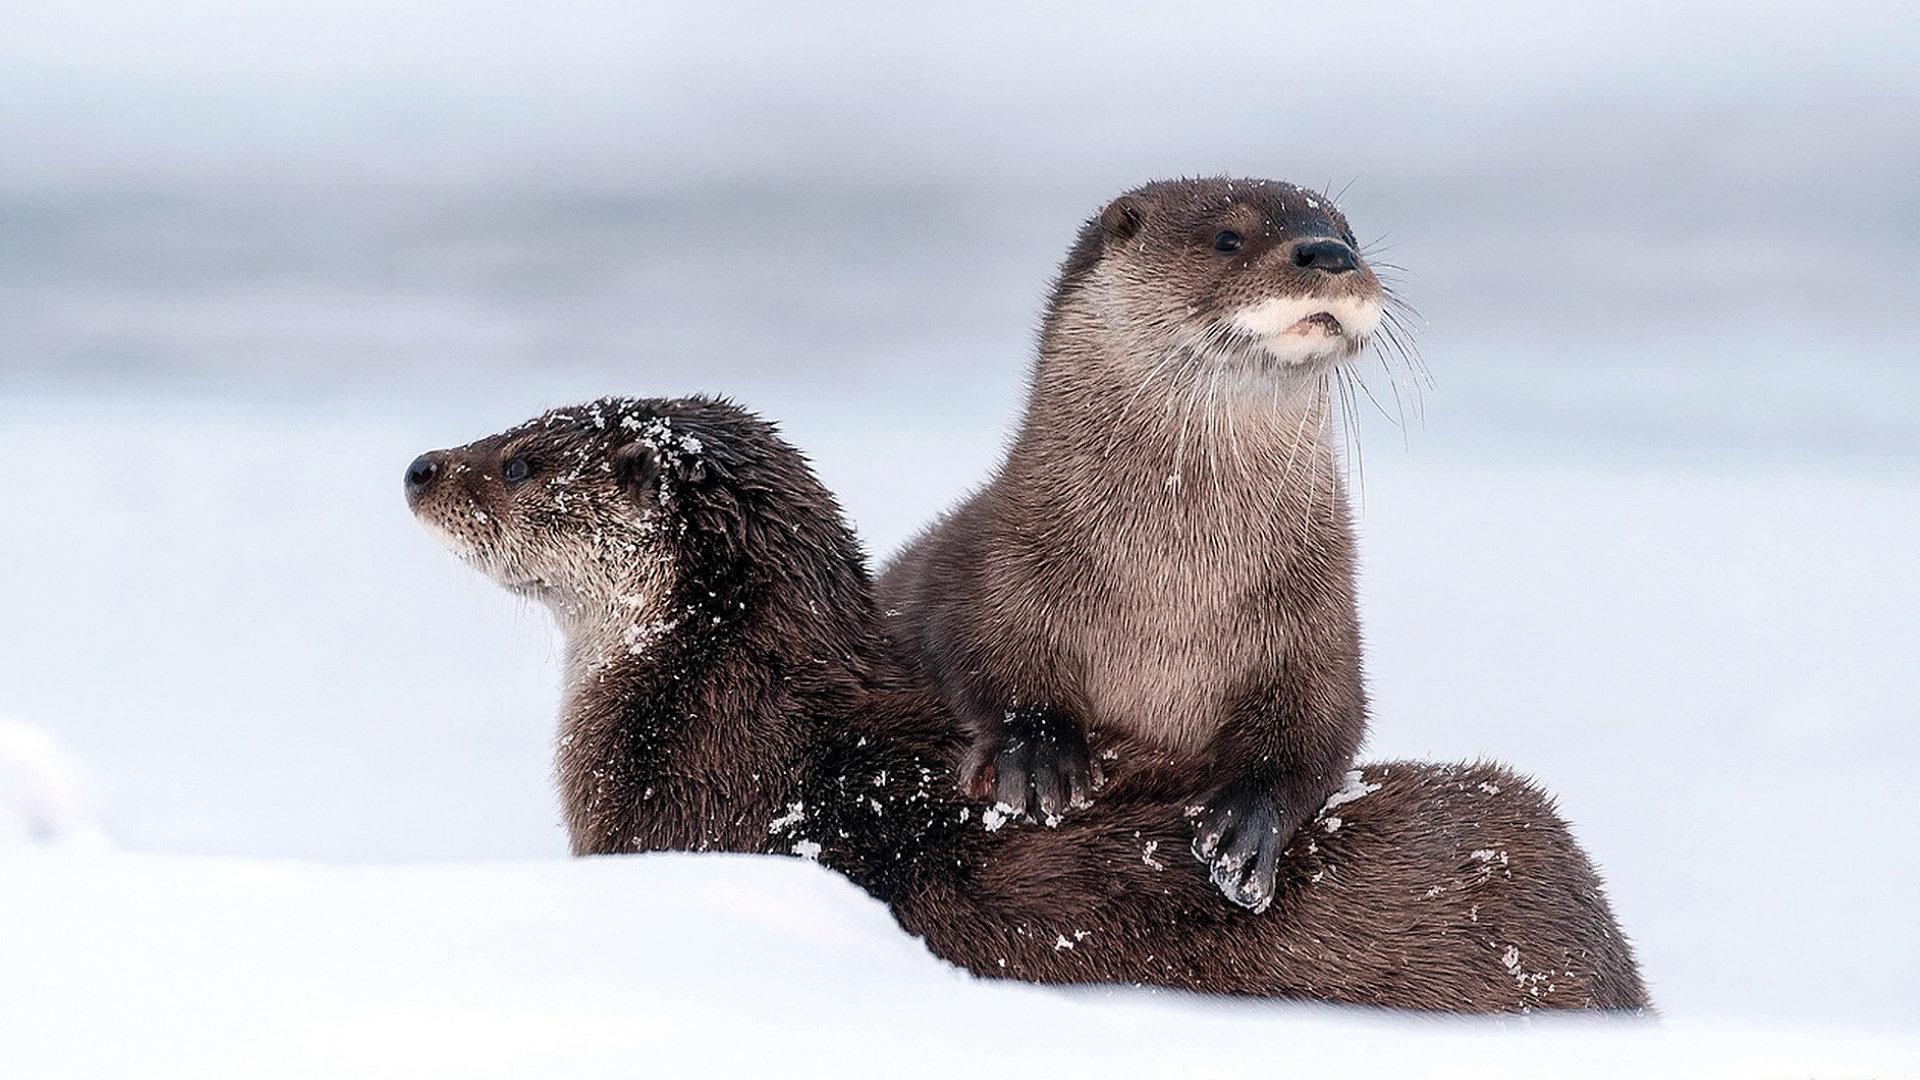 Otter Wallpaper Hd Download